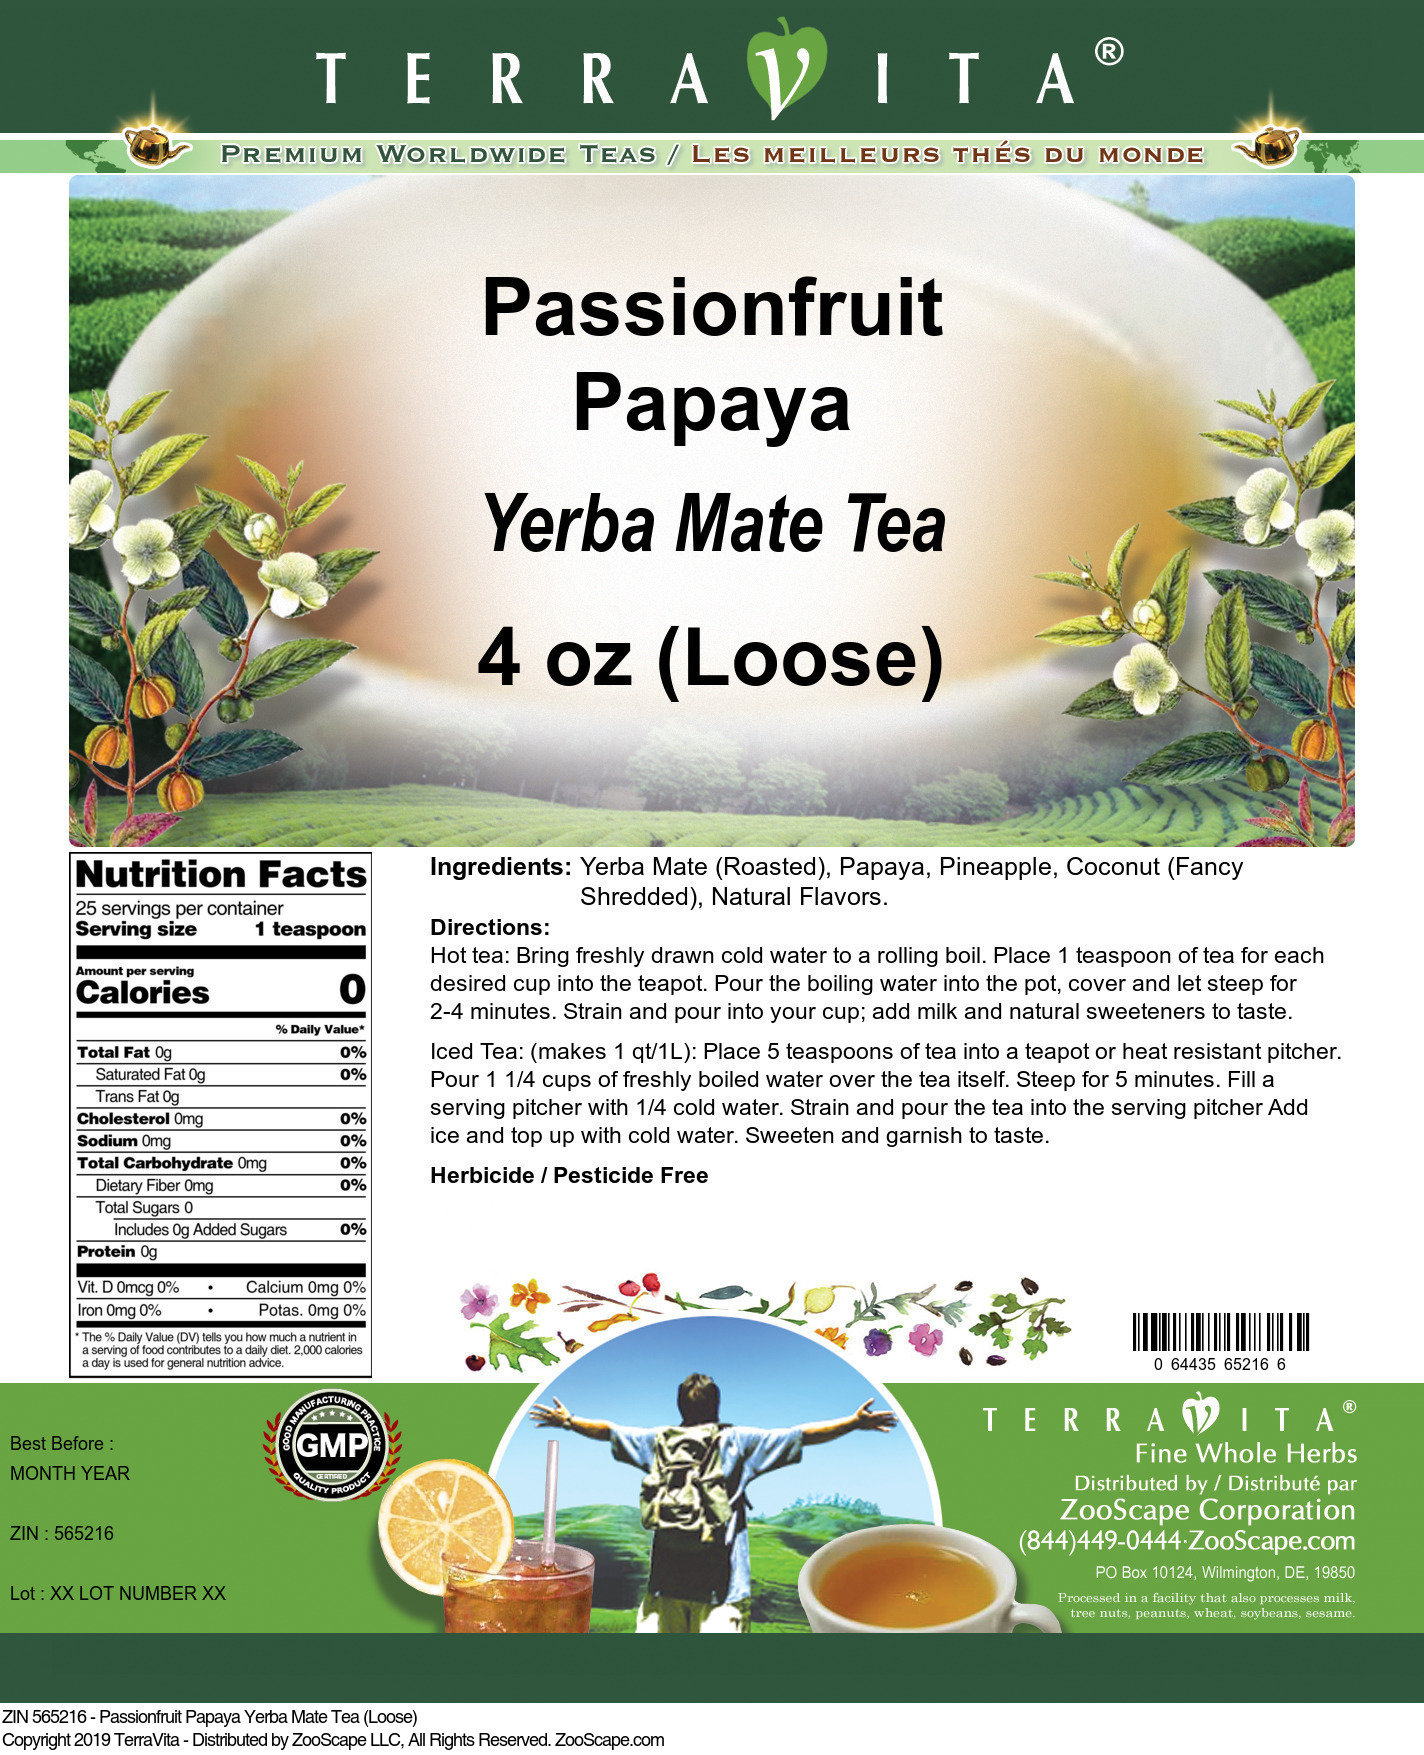 Passionfruit Papaya Yerba Mate Tea (Loose)